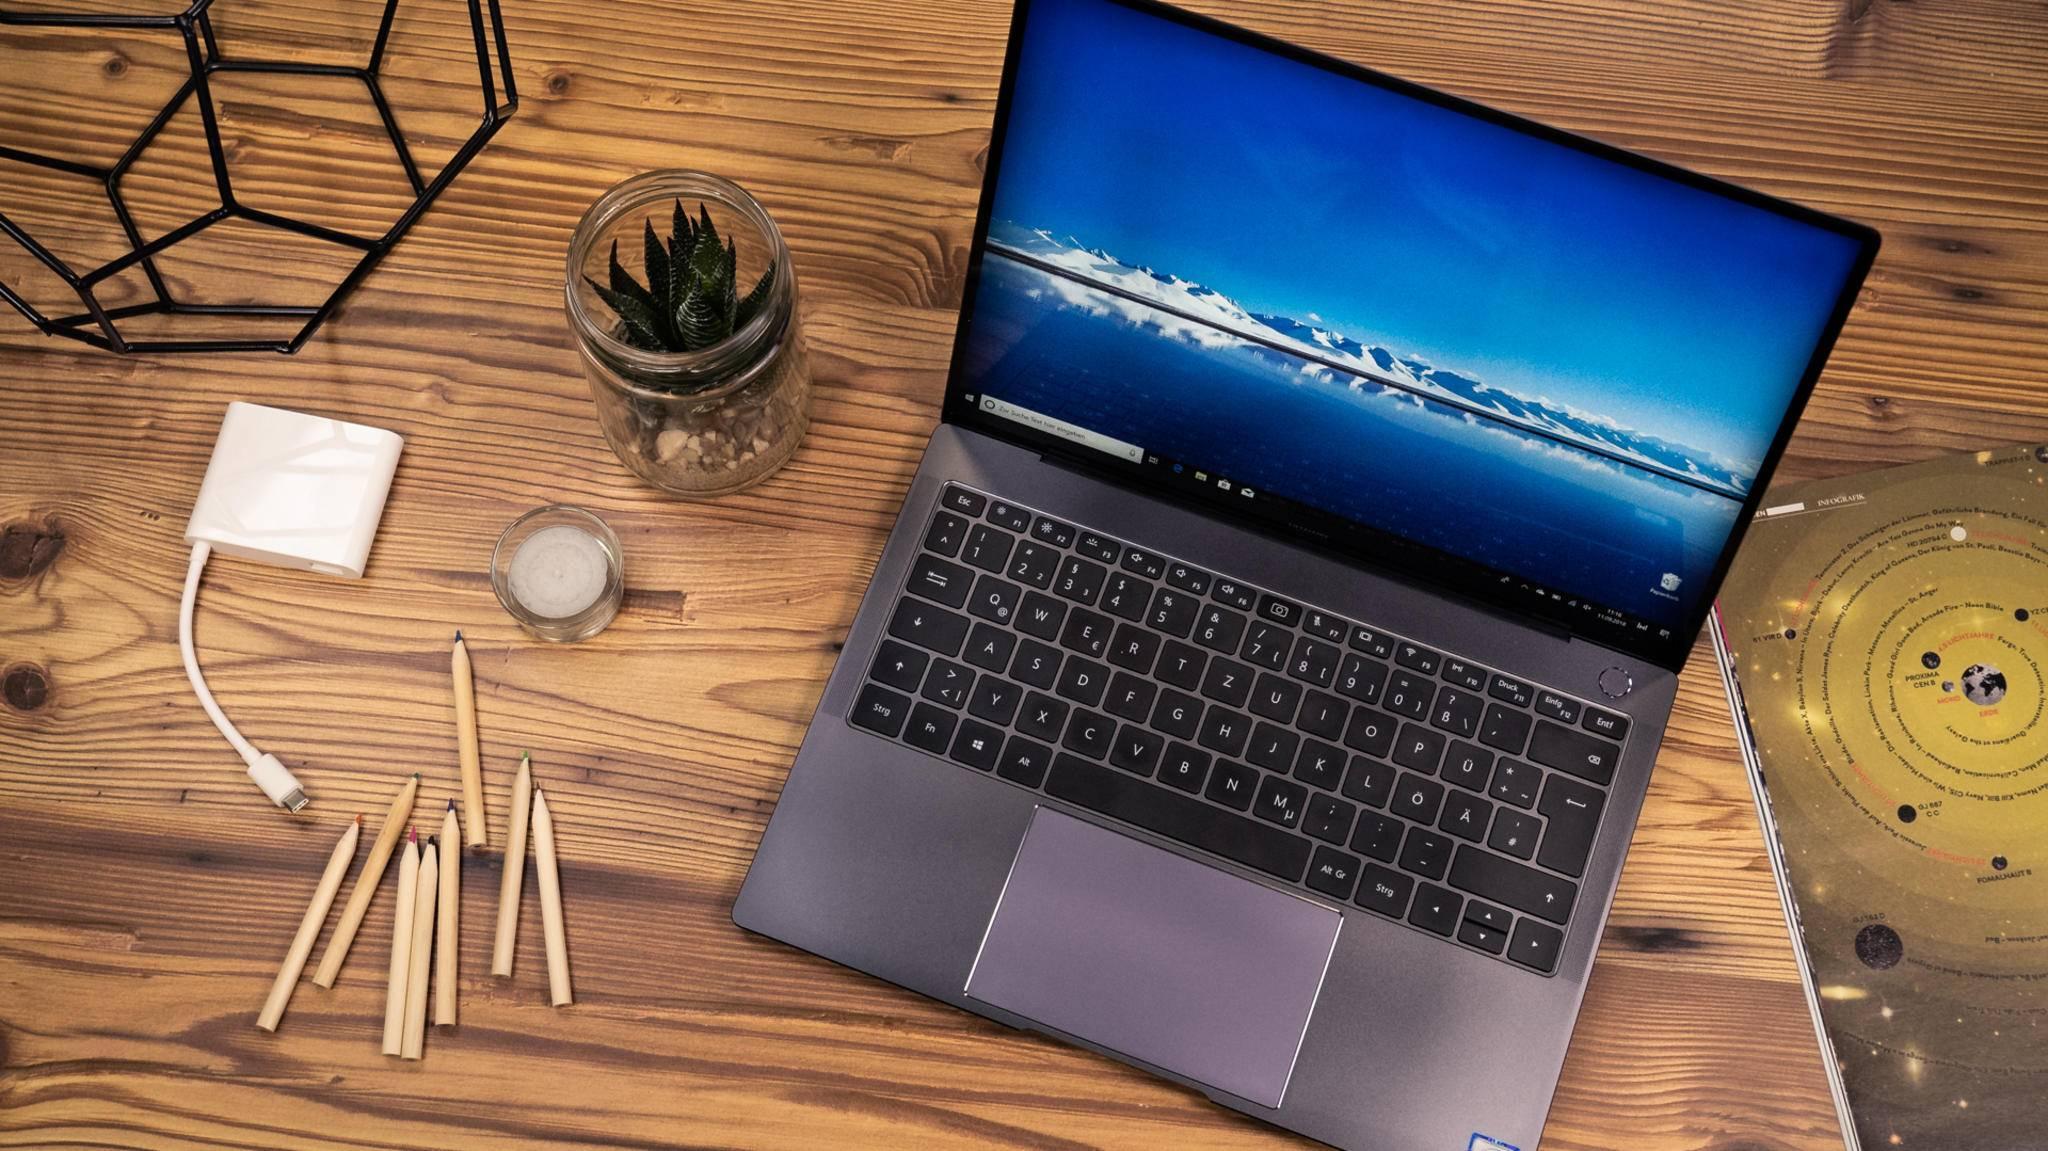 Das Huawei MateBook X Pro zählt zu den besten MacBook-Alternativen.